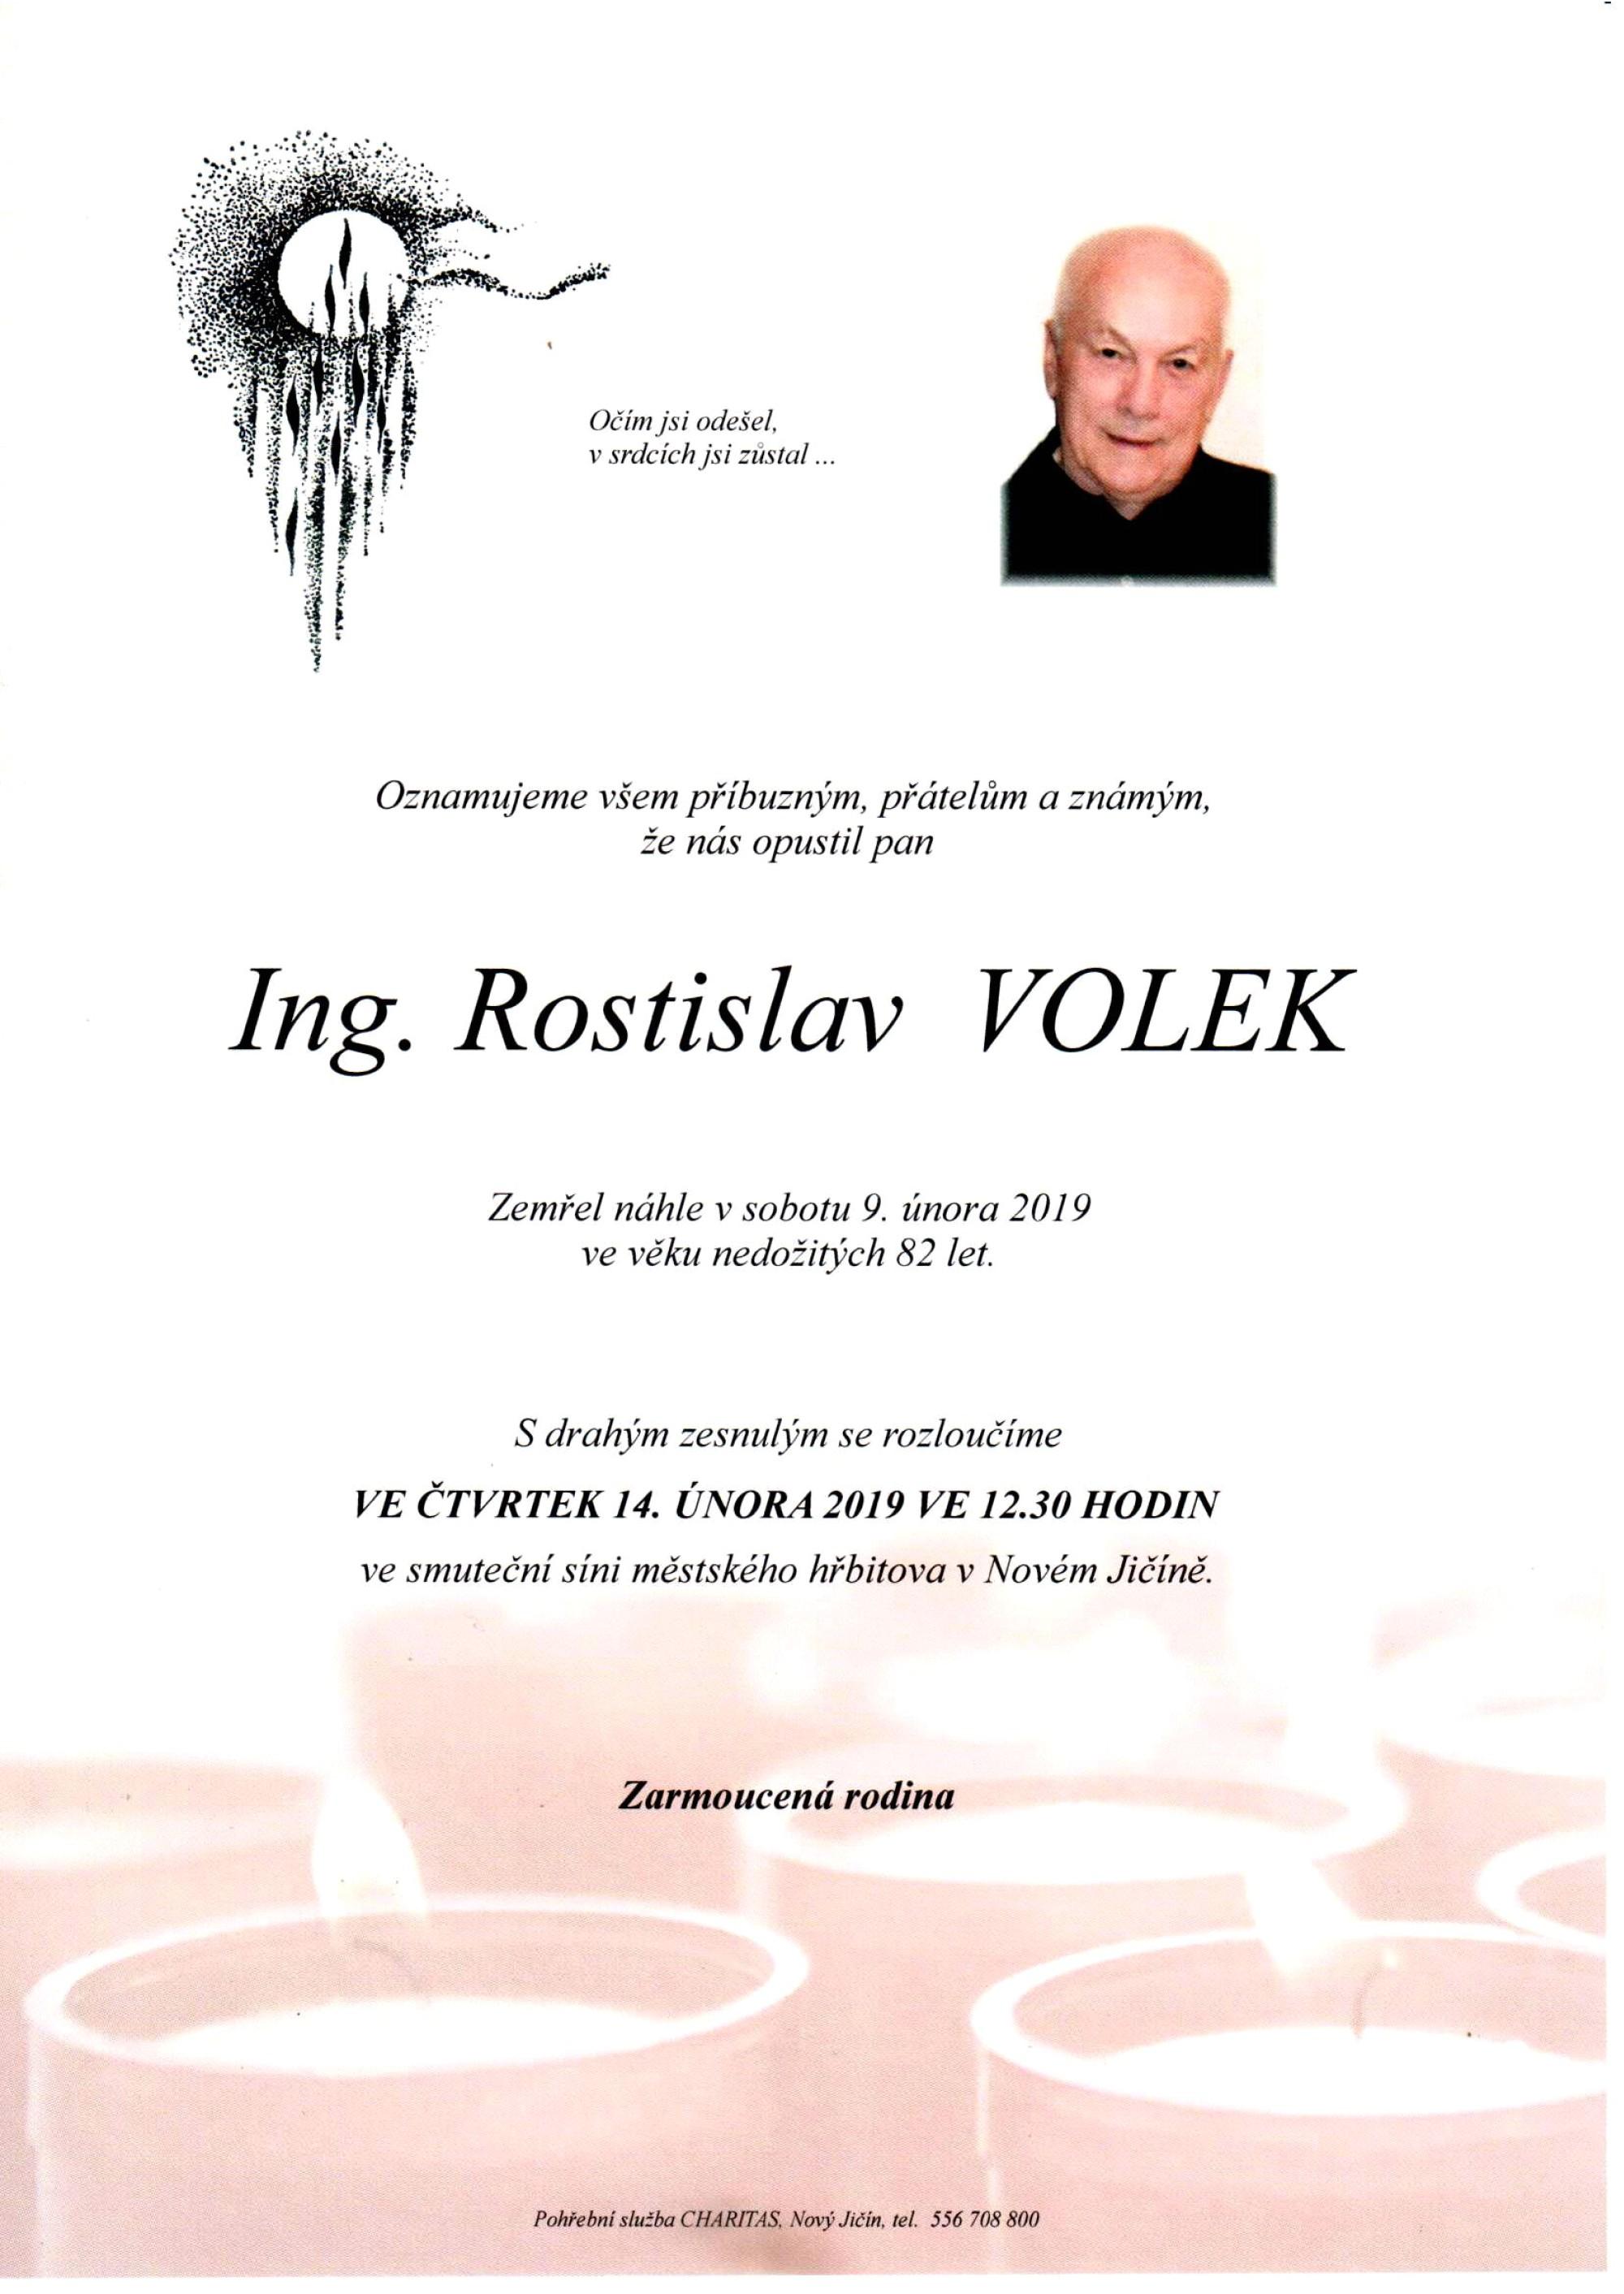 Ing. Rostislav Volek